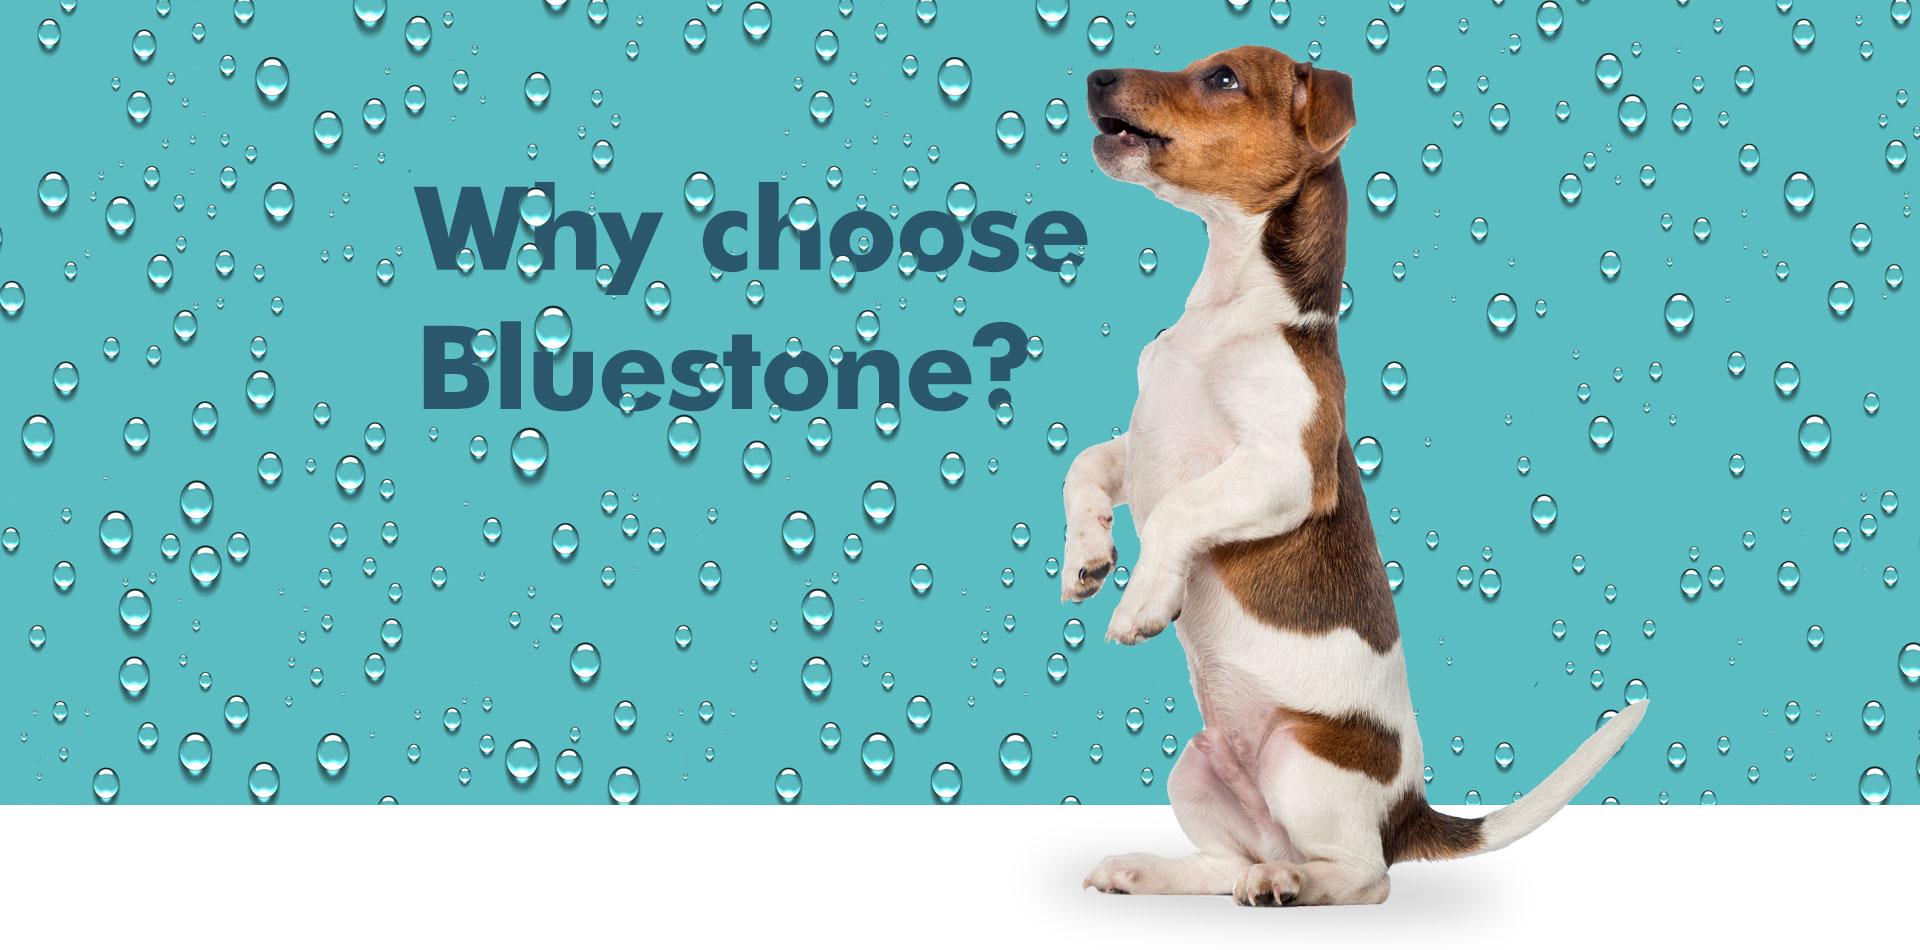 banner_WhyBluestone